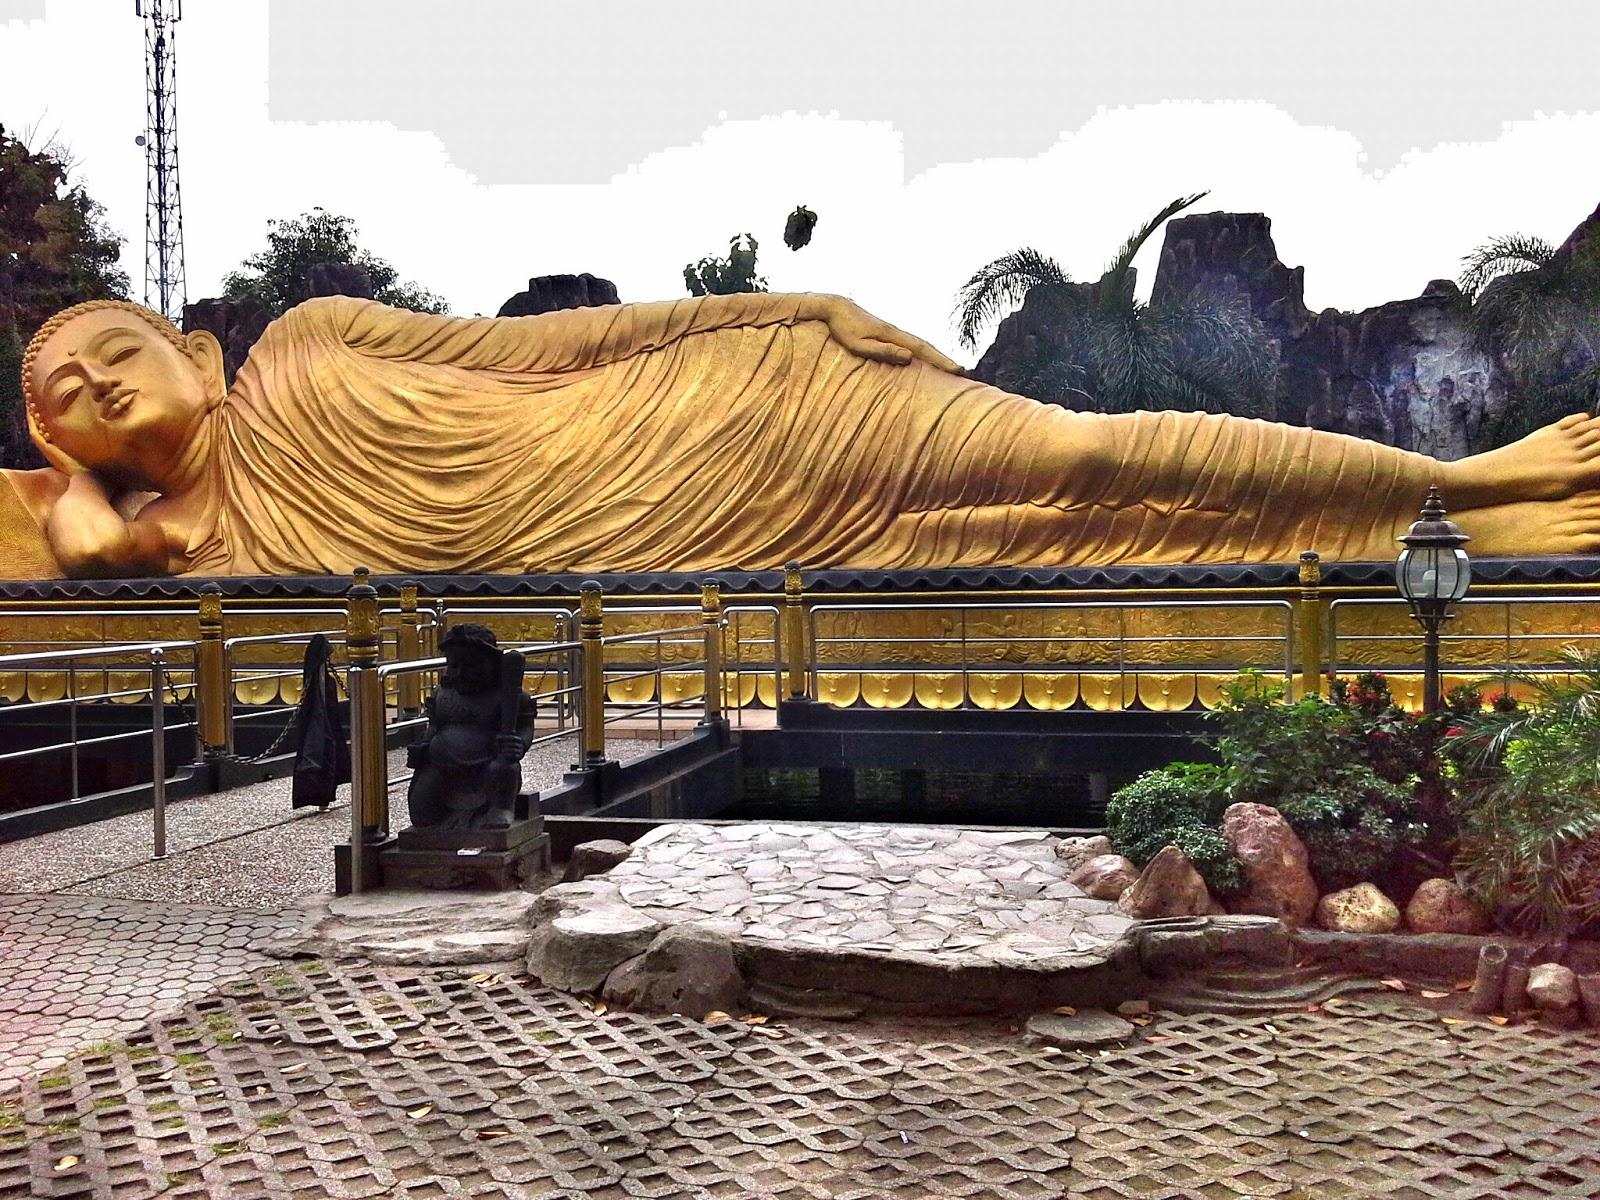 Patung Buddha Tidur Terbesar Maha Vihara Majapahit Mojopahit Kab Mojokerto